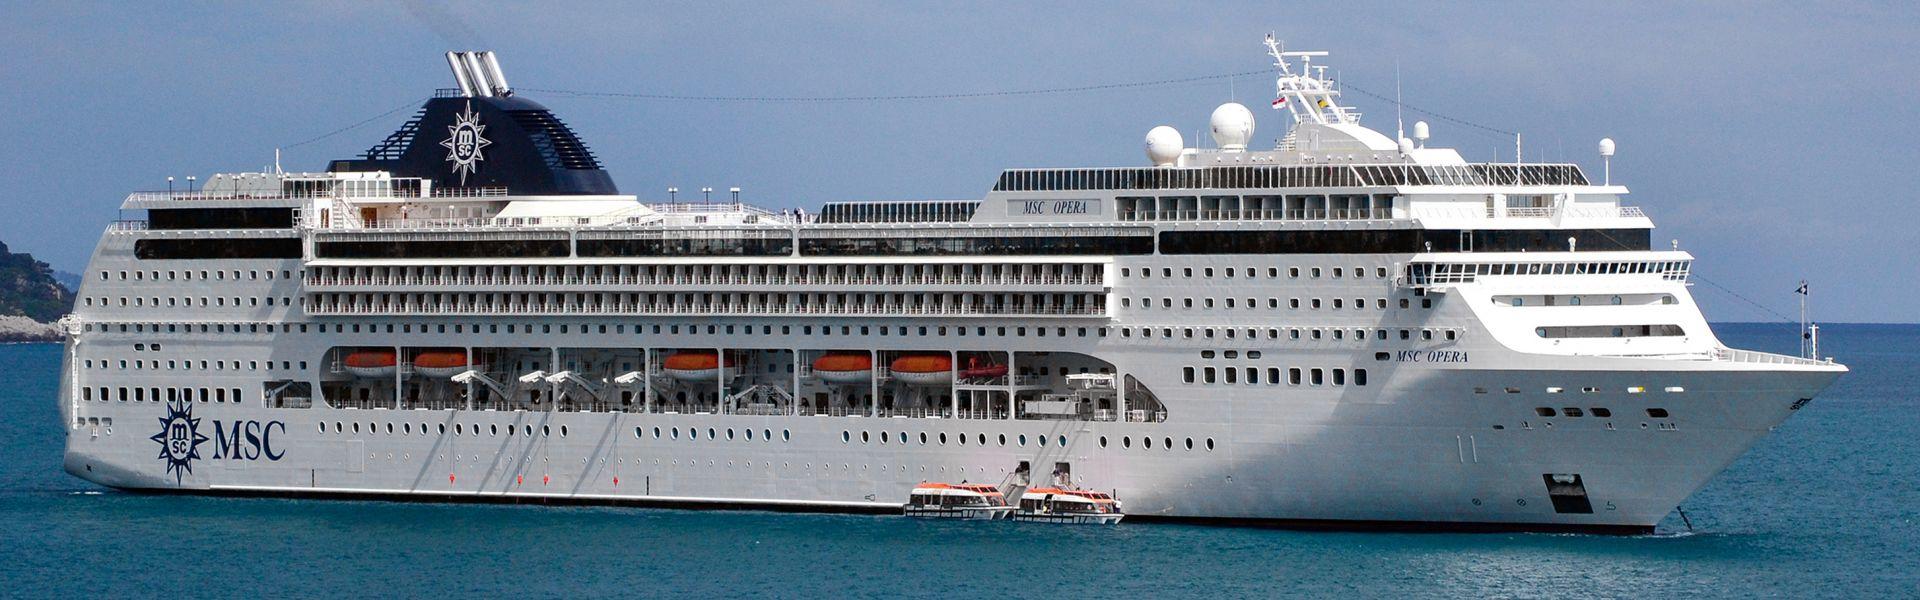 Croaziera Grup Organizat 2017 cu ZBOR INCLUS - Cuba si Caraibe (Havana) - MSC Cruises - MSC Opera - 13 nopti